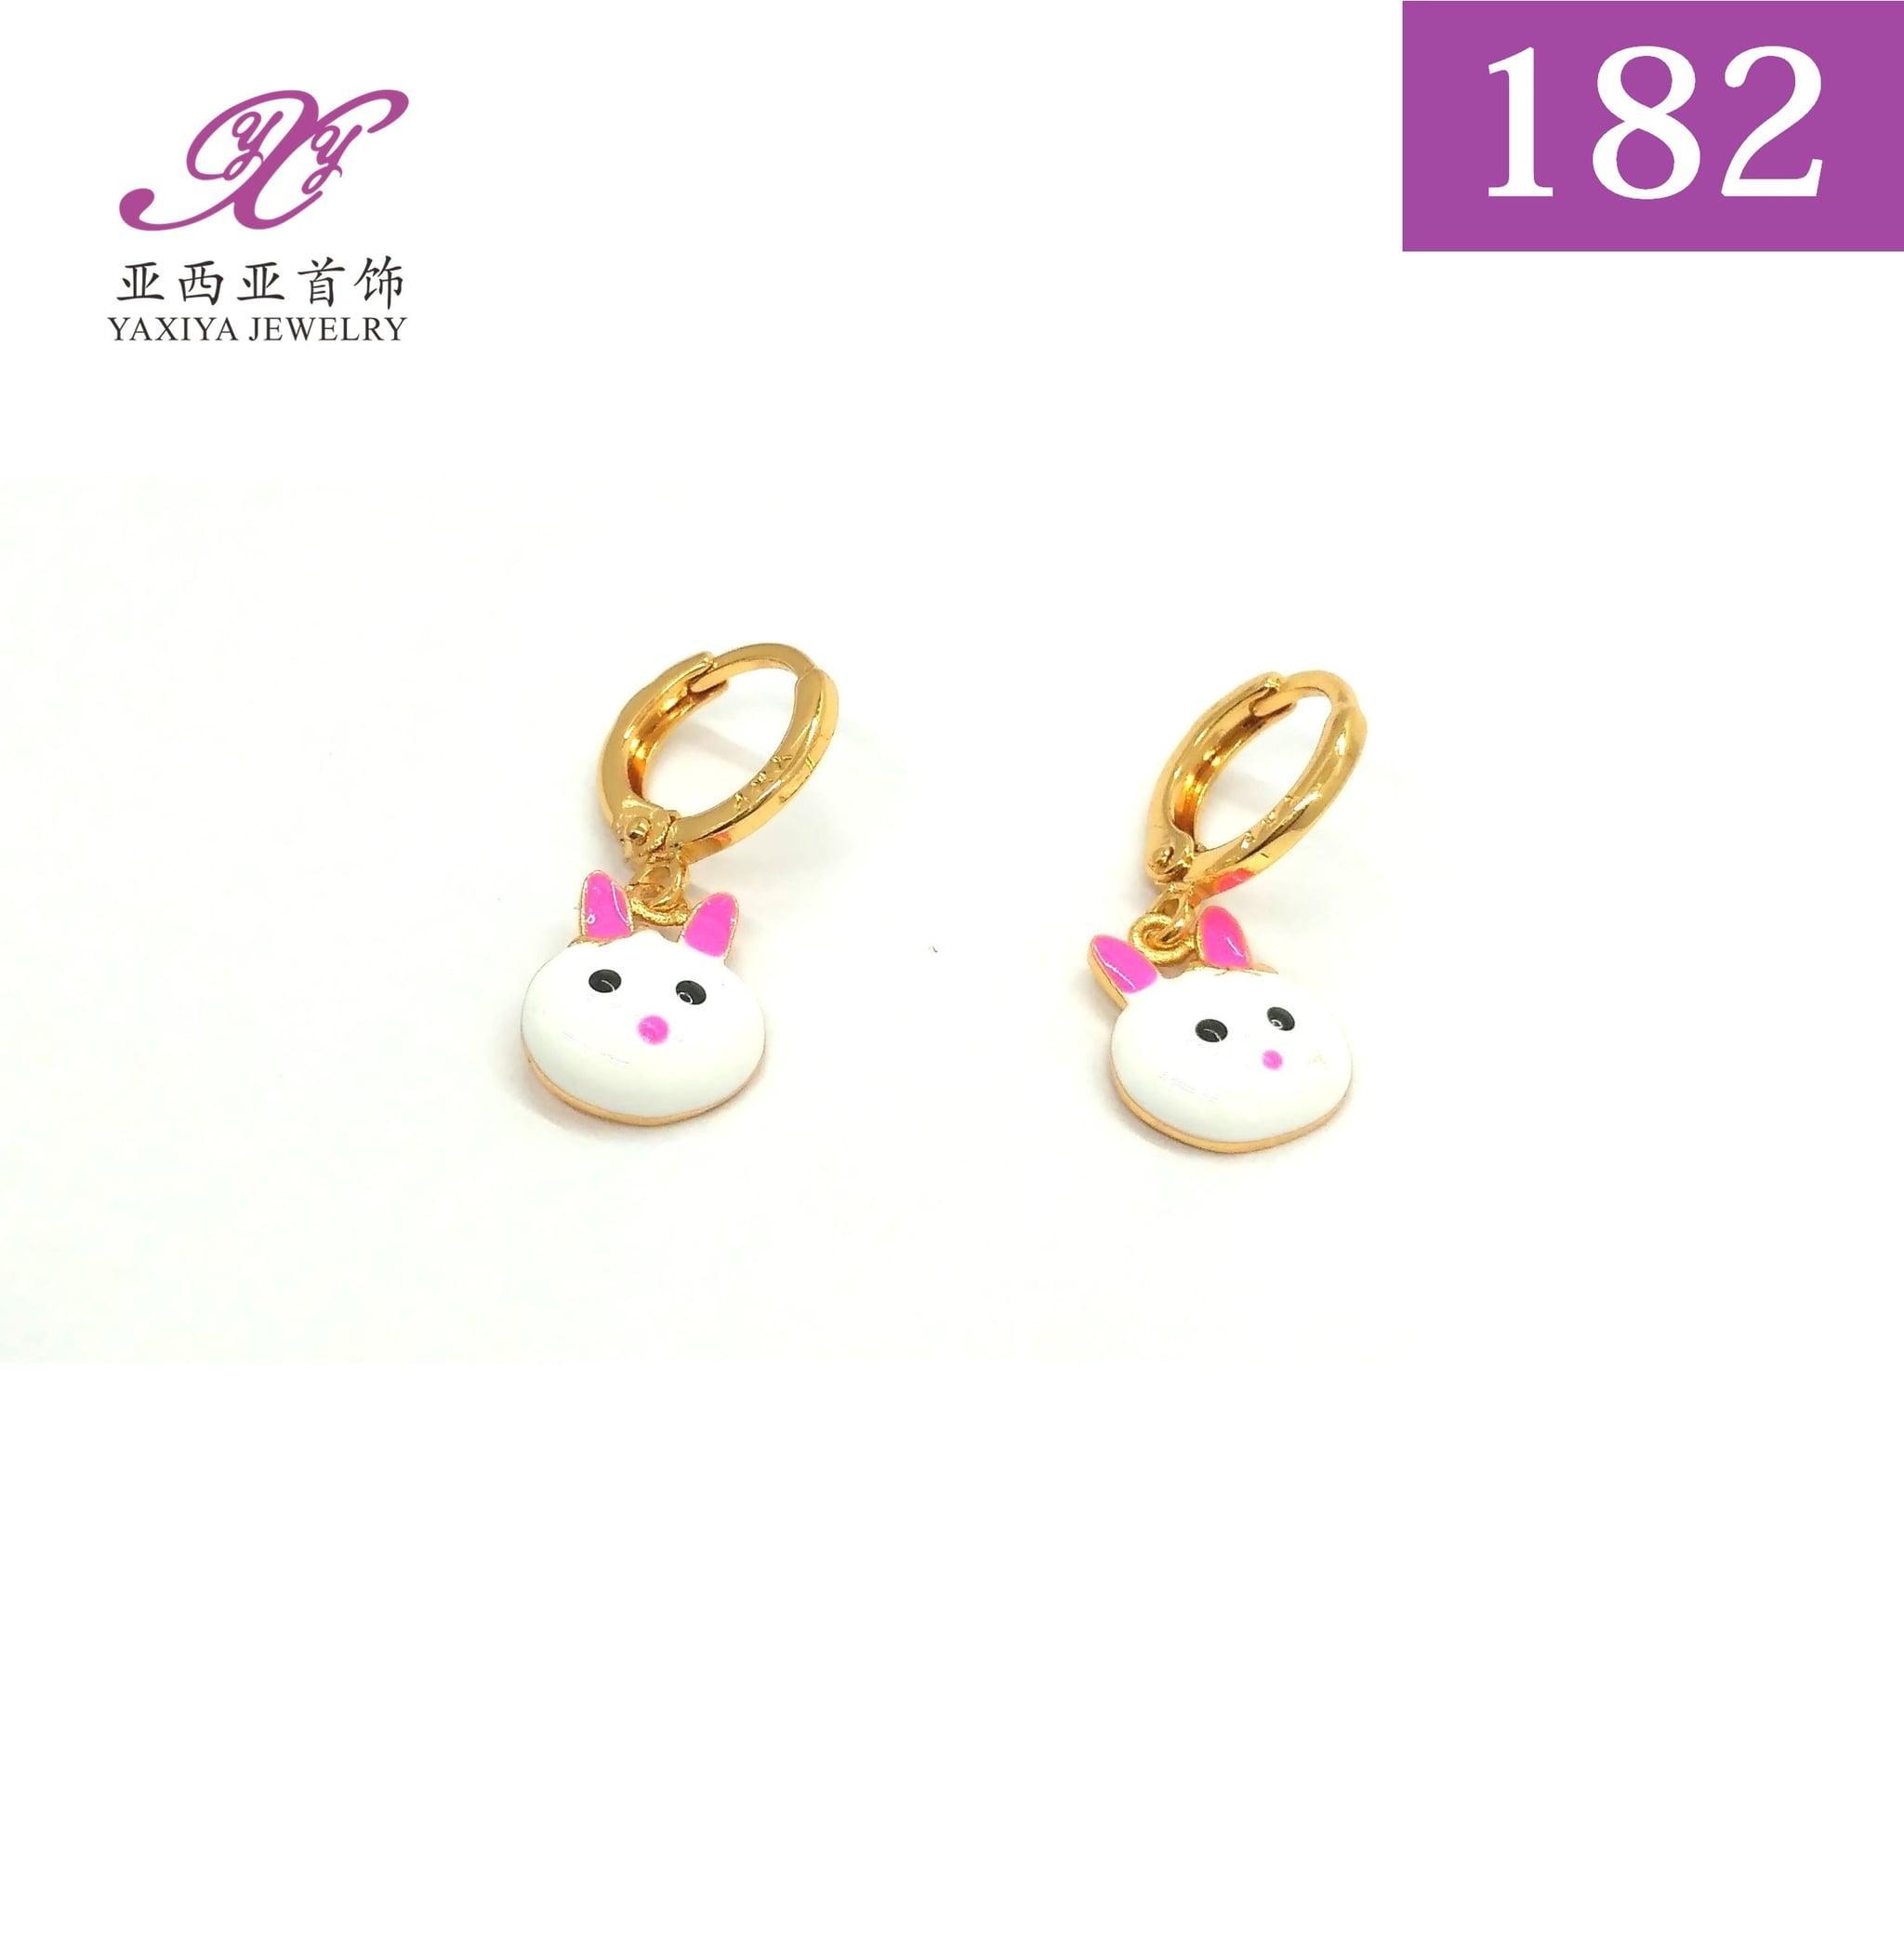 Anting Anak Lapis emas Perhiasan imitasi Gold 18k Yaxiya Jewelry 182